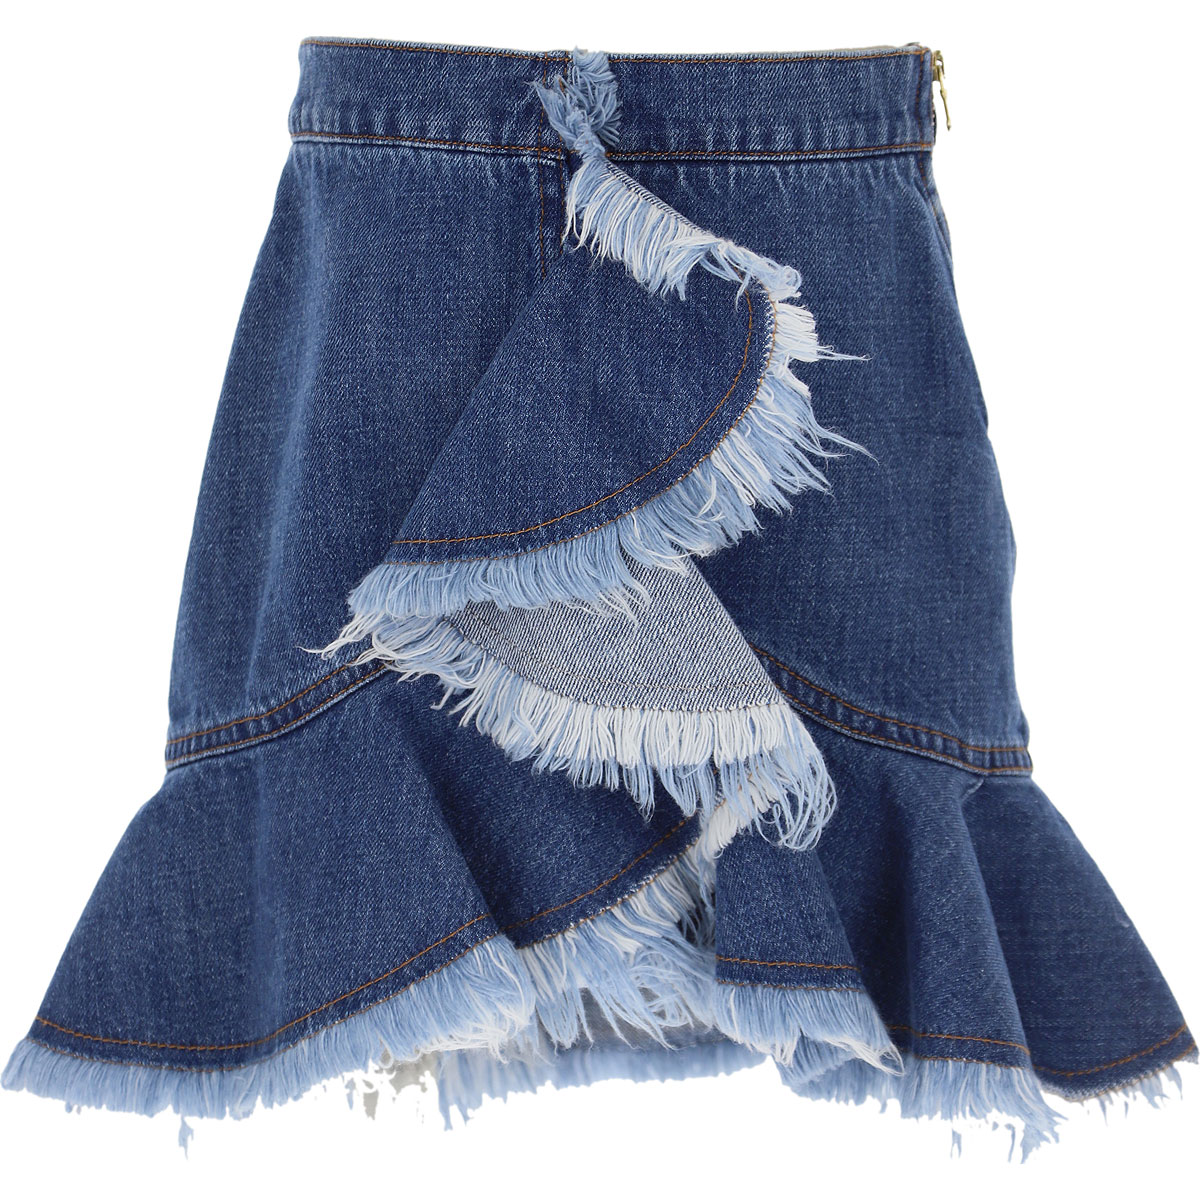 Philosophy di Lorenzo Serafini Kids Skirts for Girls On Sale, Blue Denim, Cotton, 2019, L XS XXS